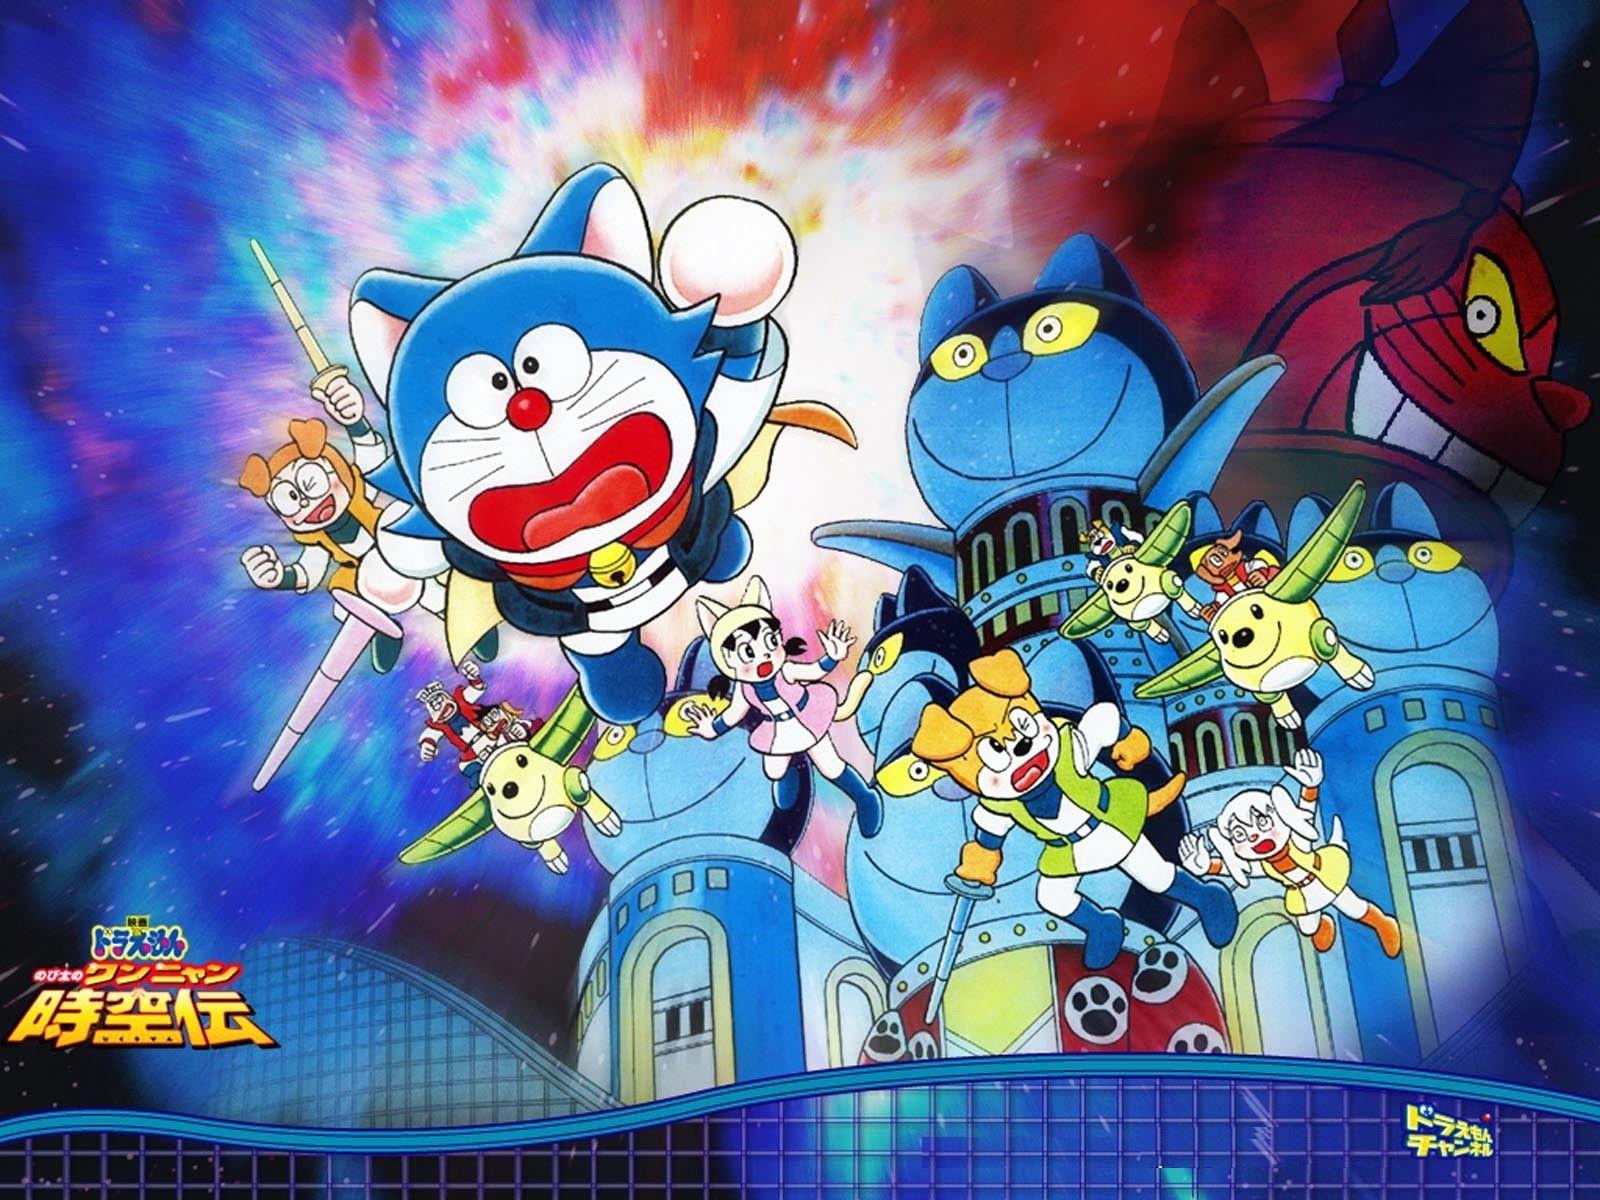 Doraemon Movie HD Wallpapers - Wallpaper Cave